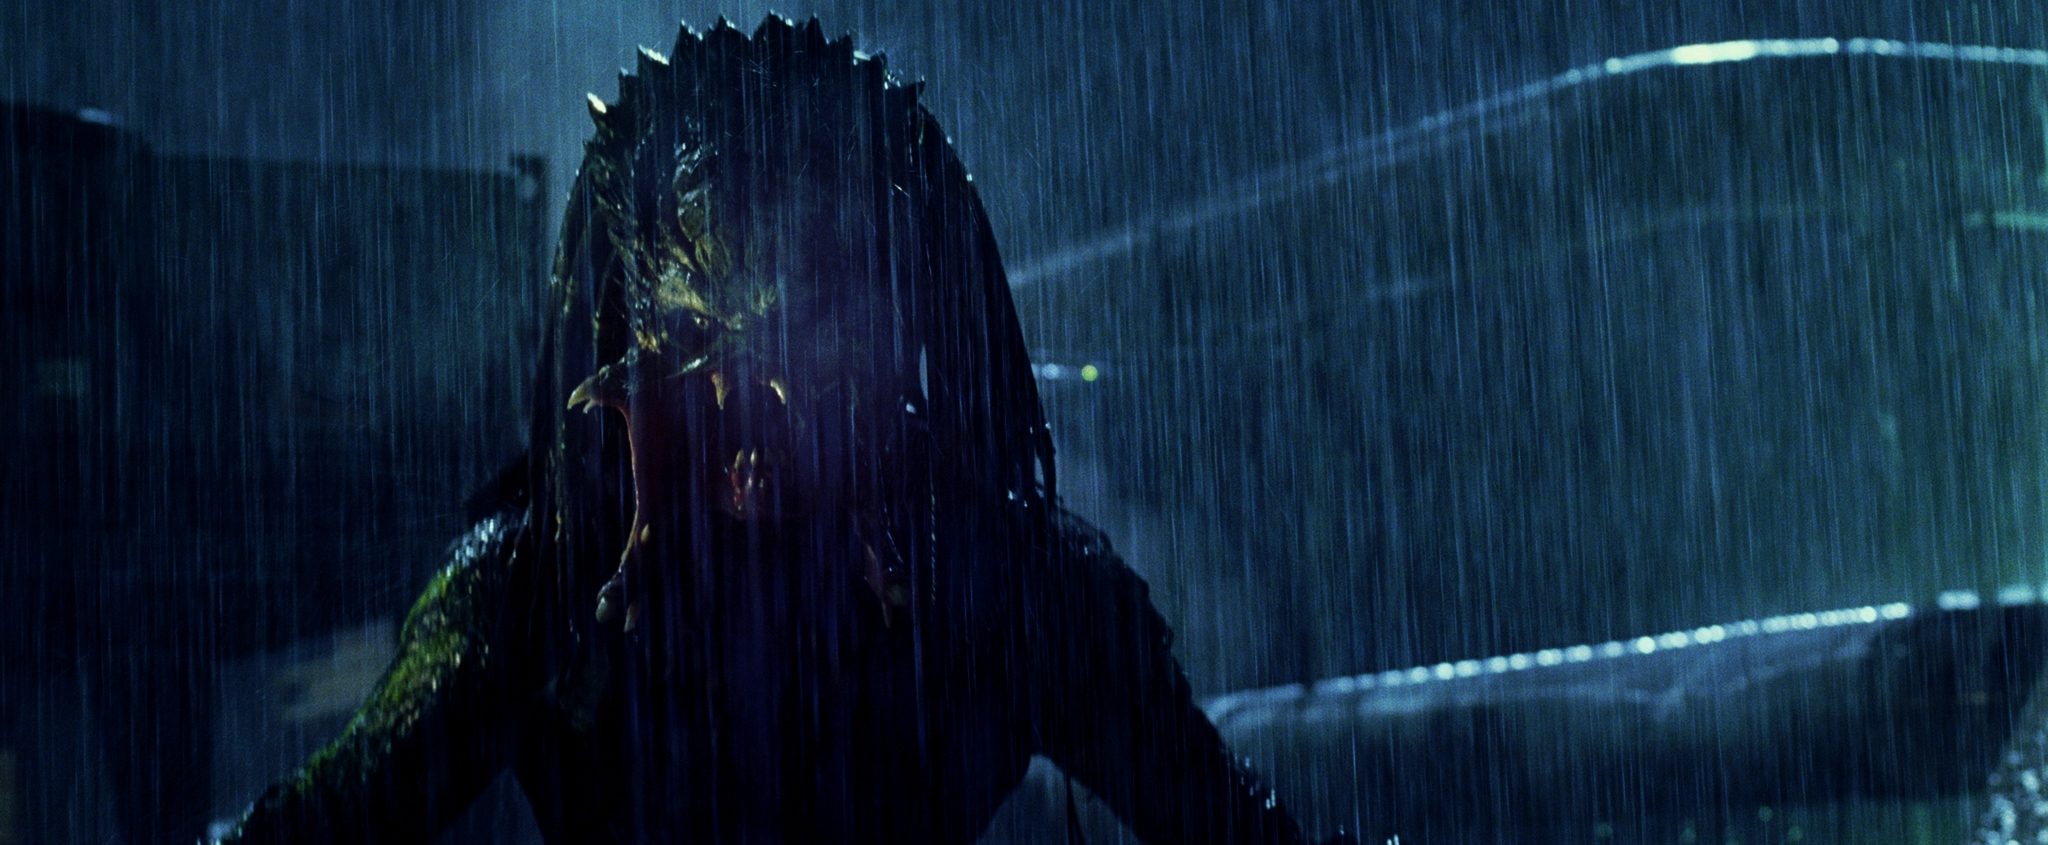 Predator vs watch requiem alien Hotstar Temporarily